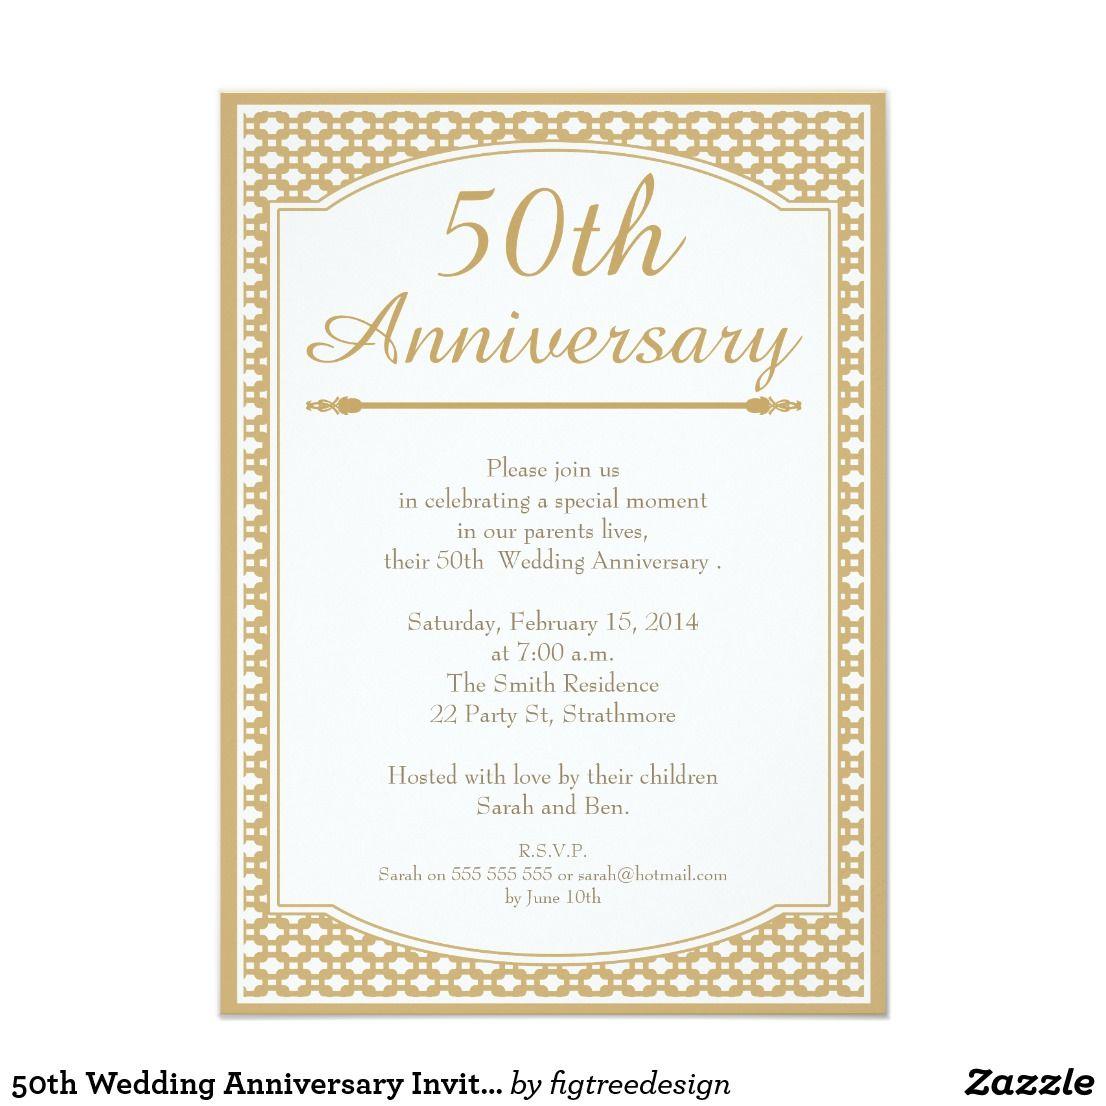 50th Wedding Anniversary Invitation | 50th wedding anniversary ...